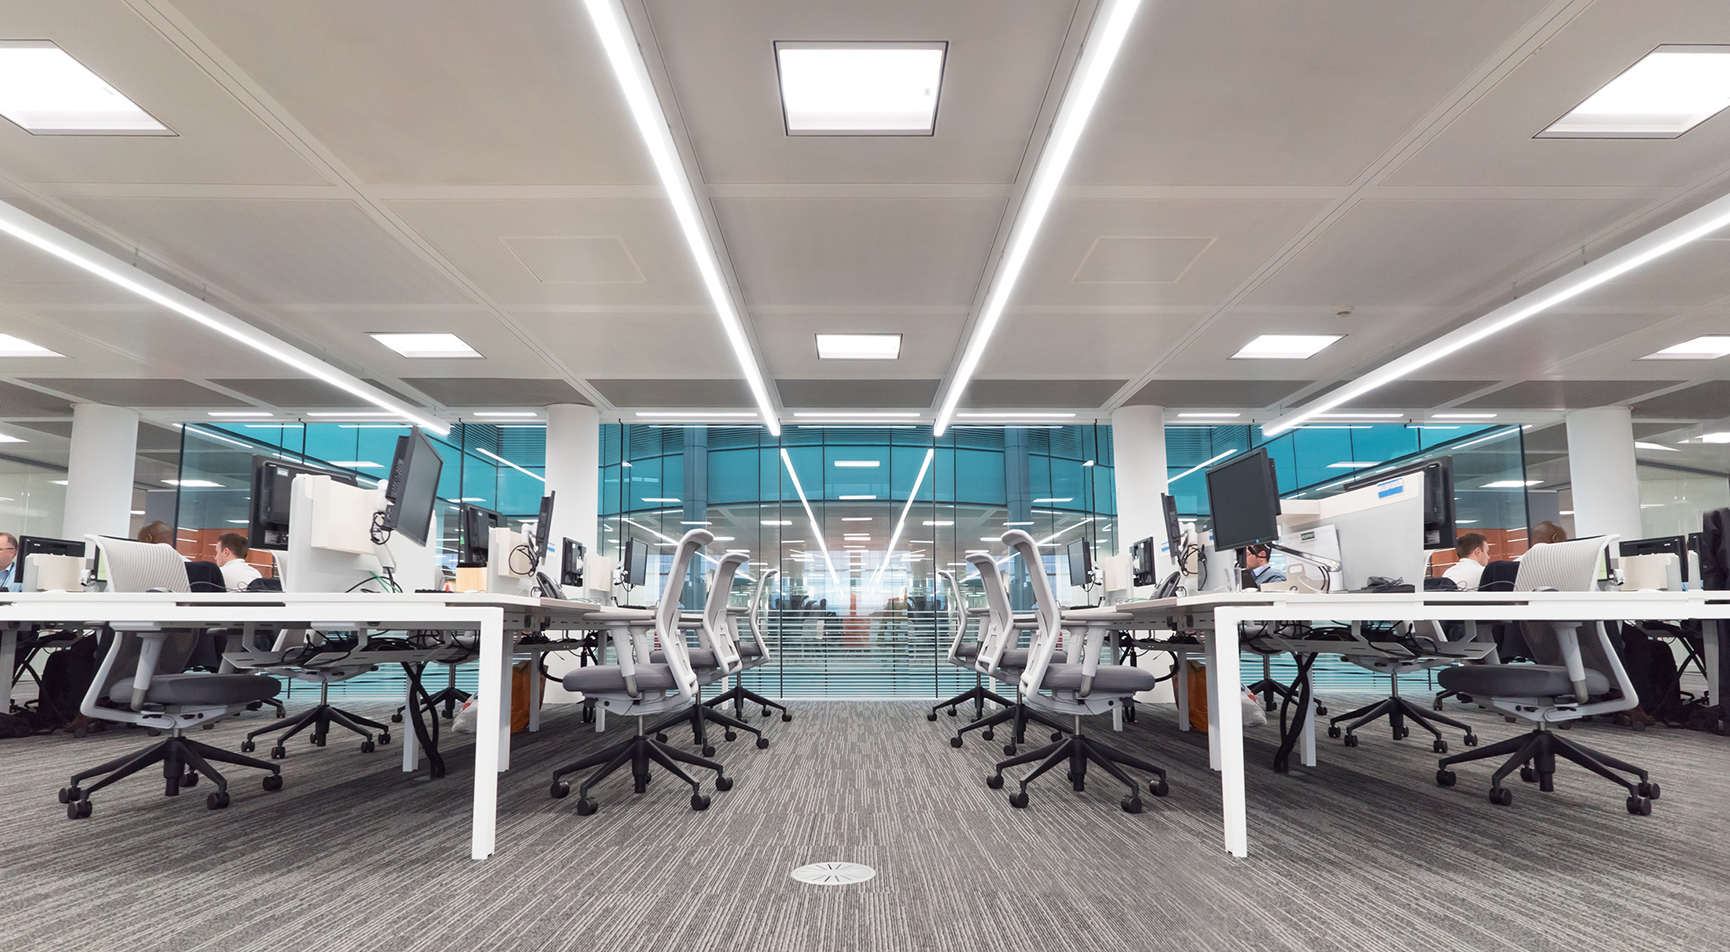 baskerville-office-space